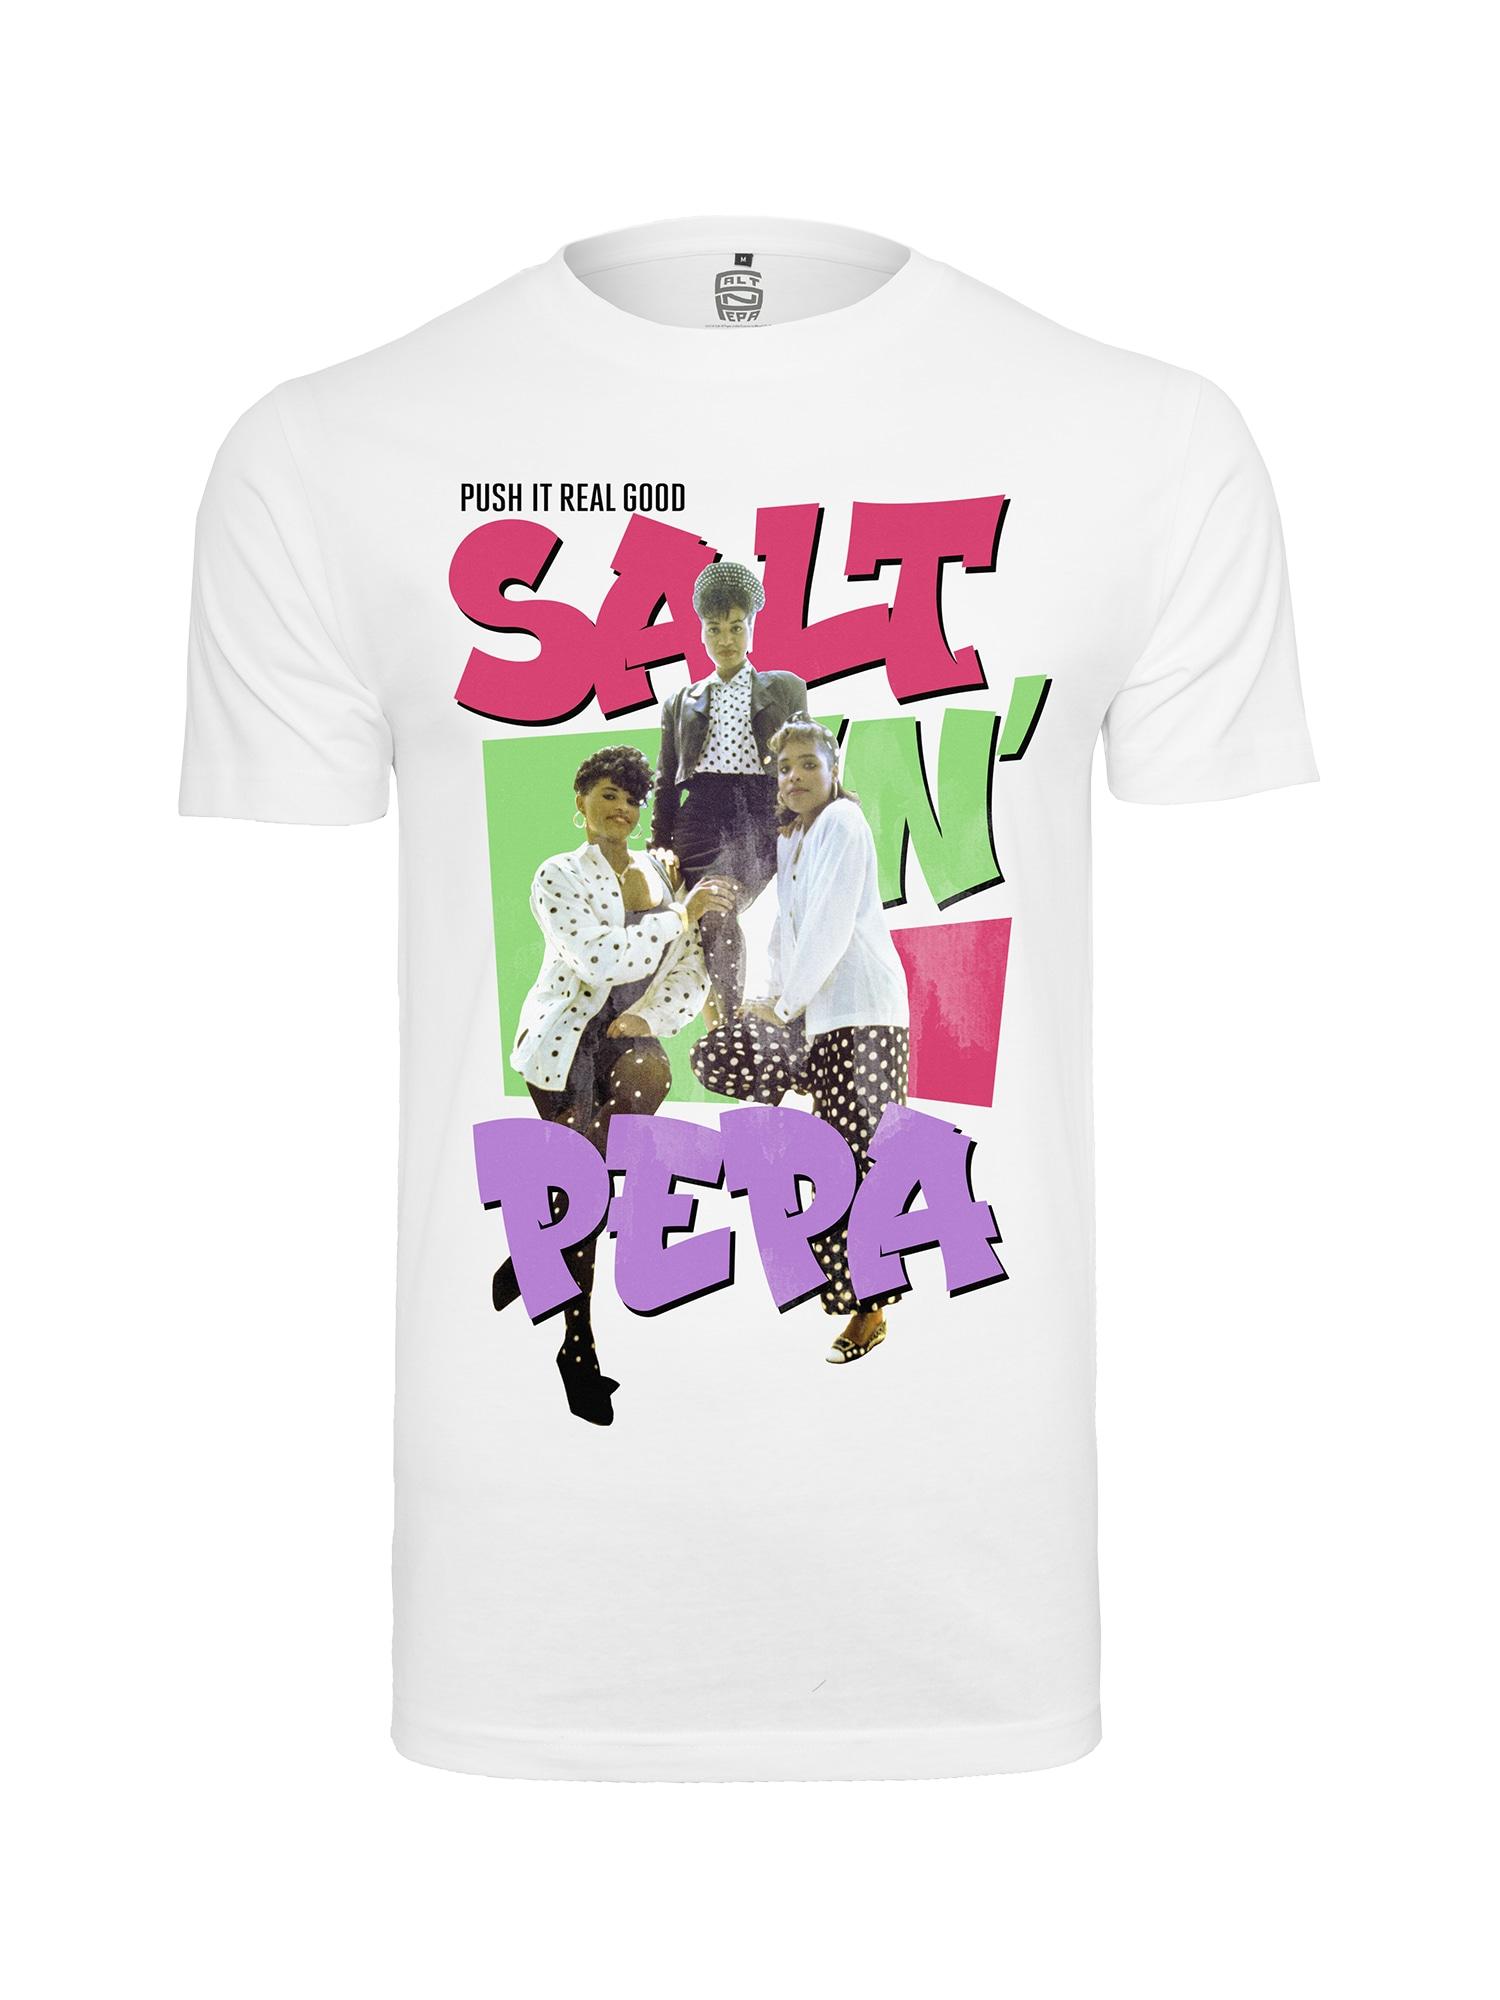 Tričko Ladies Salt N Pepa Tee světle zelená světle fialová pink bílá Merchcode